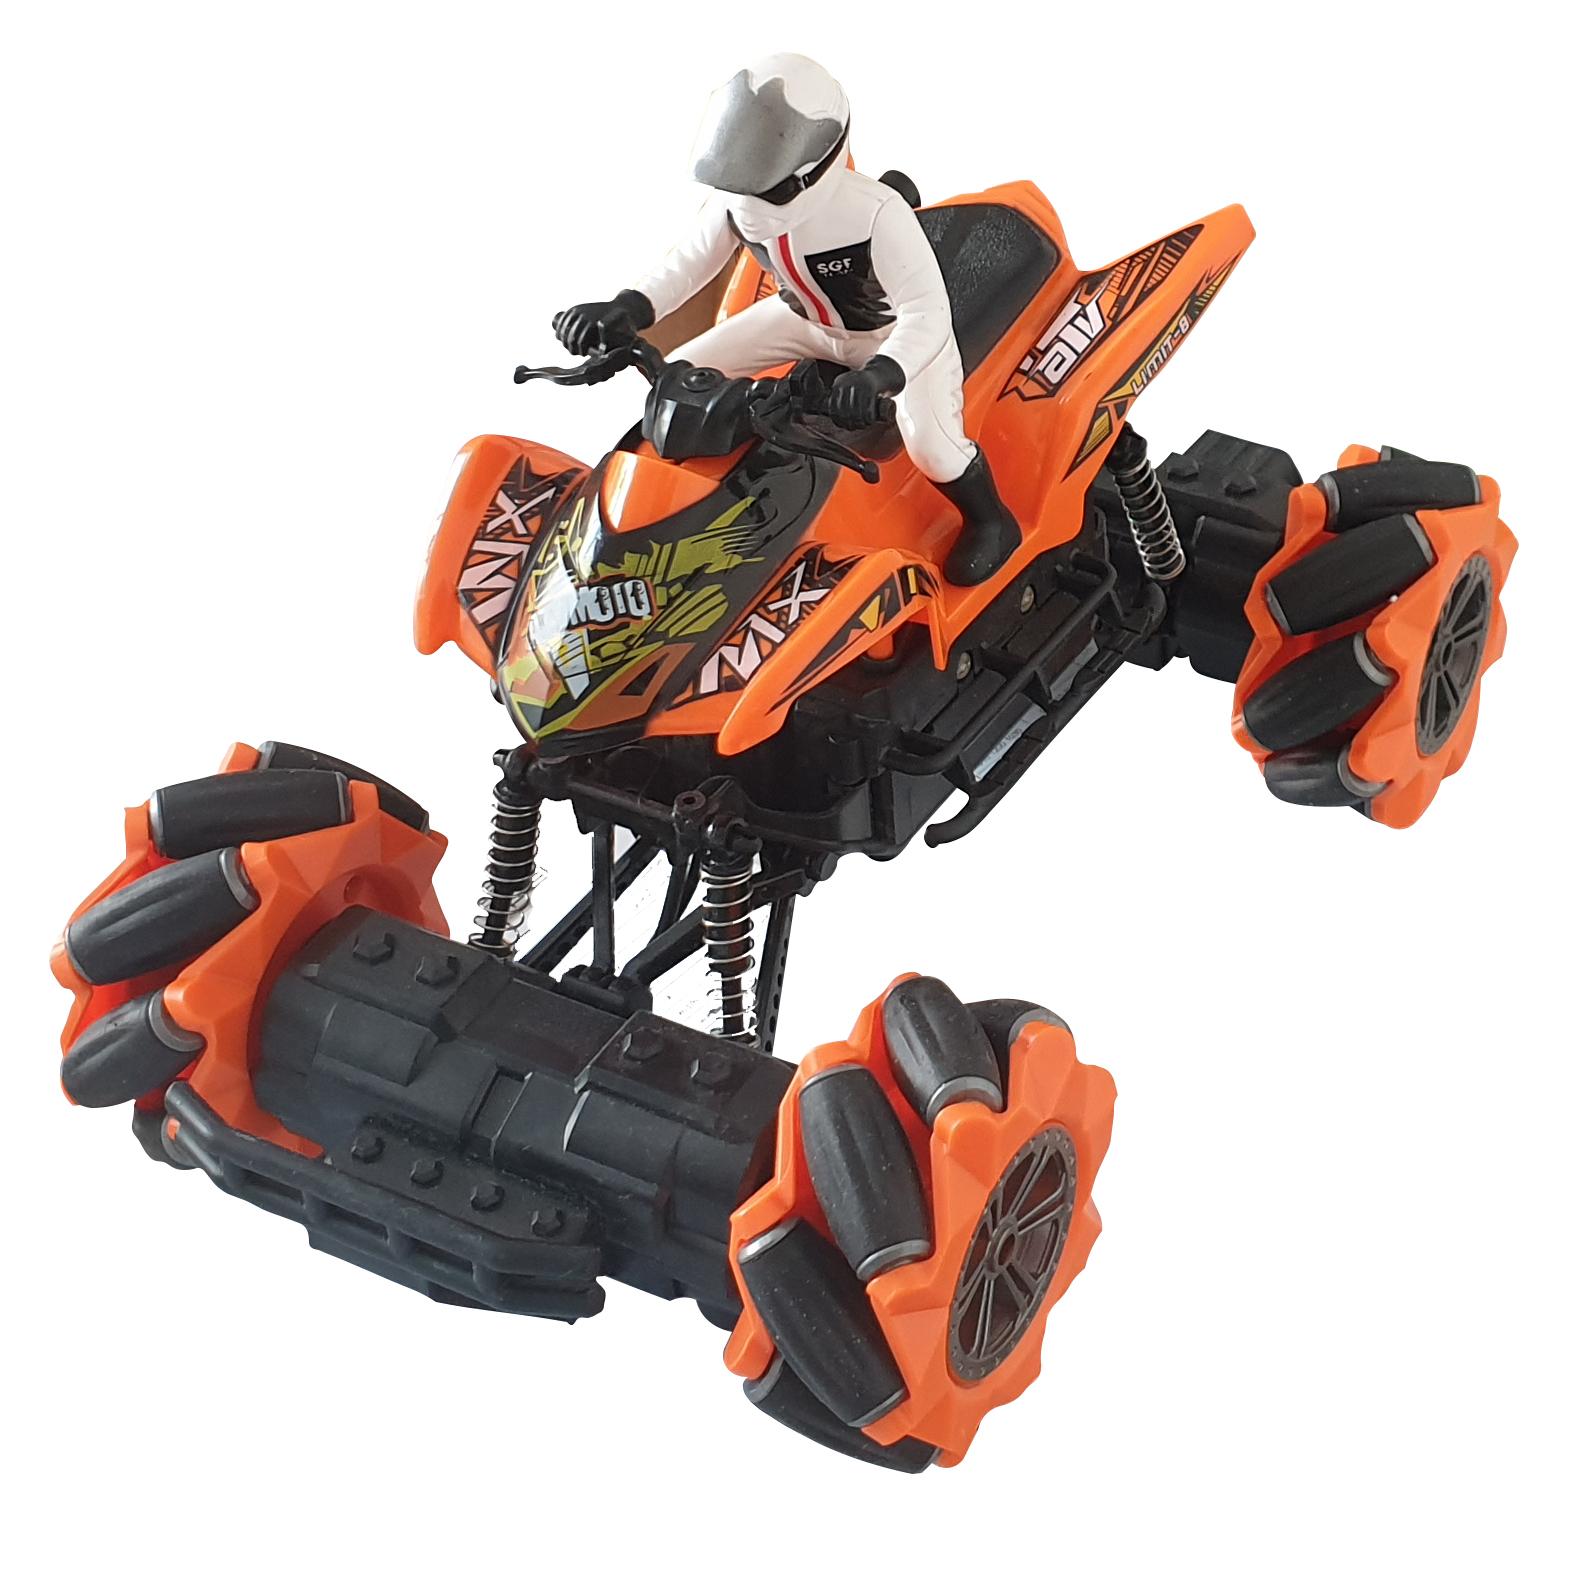 موتور بازی کنترلی مدل Rock cross country